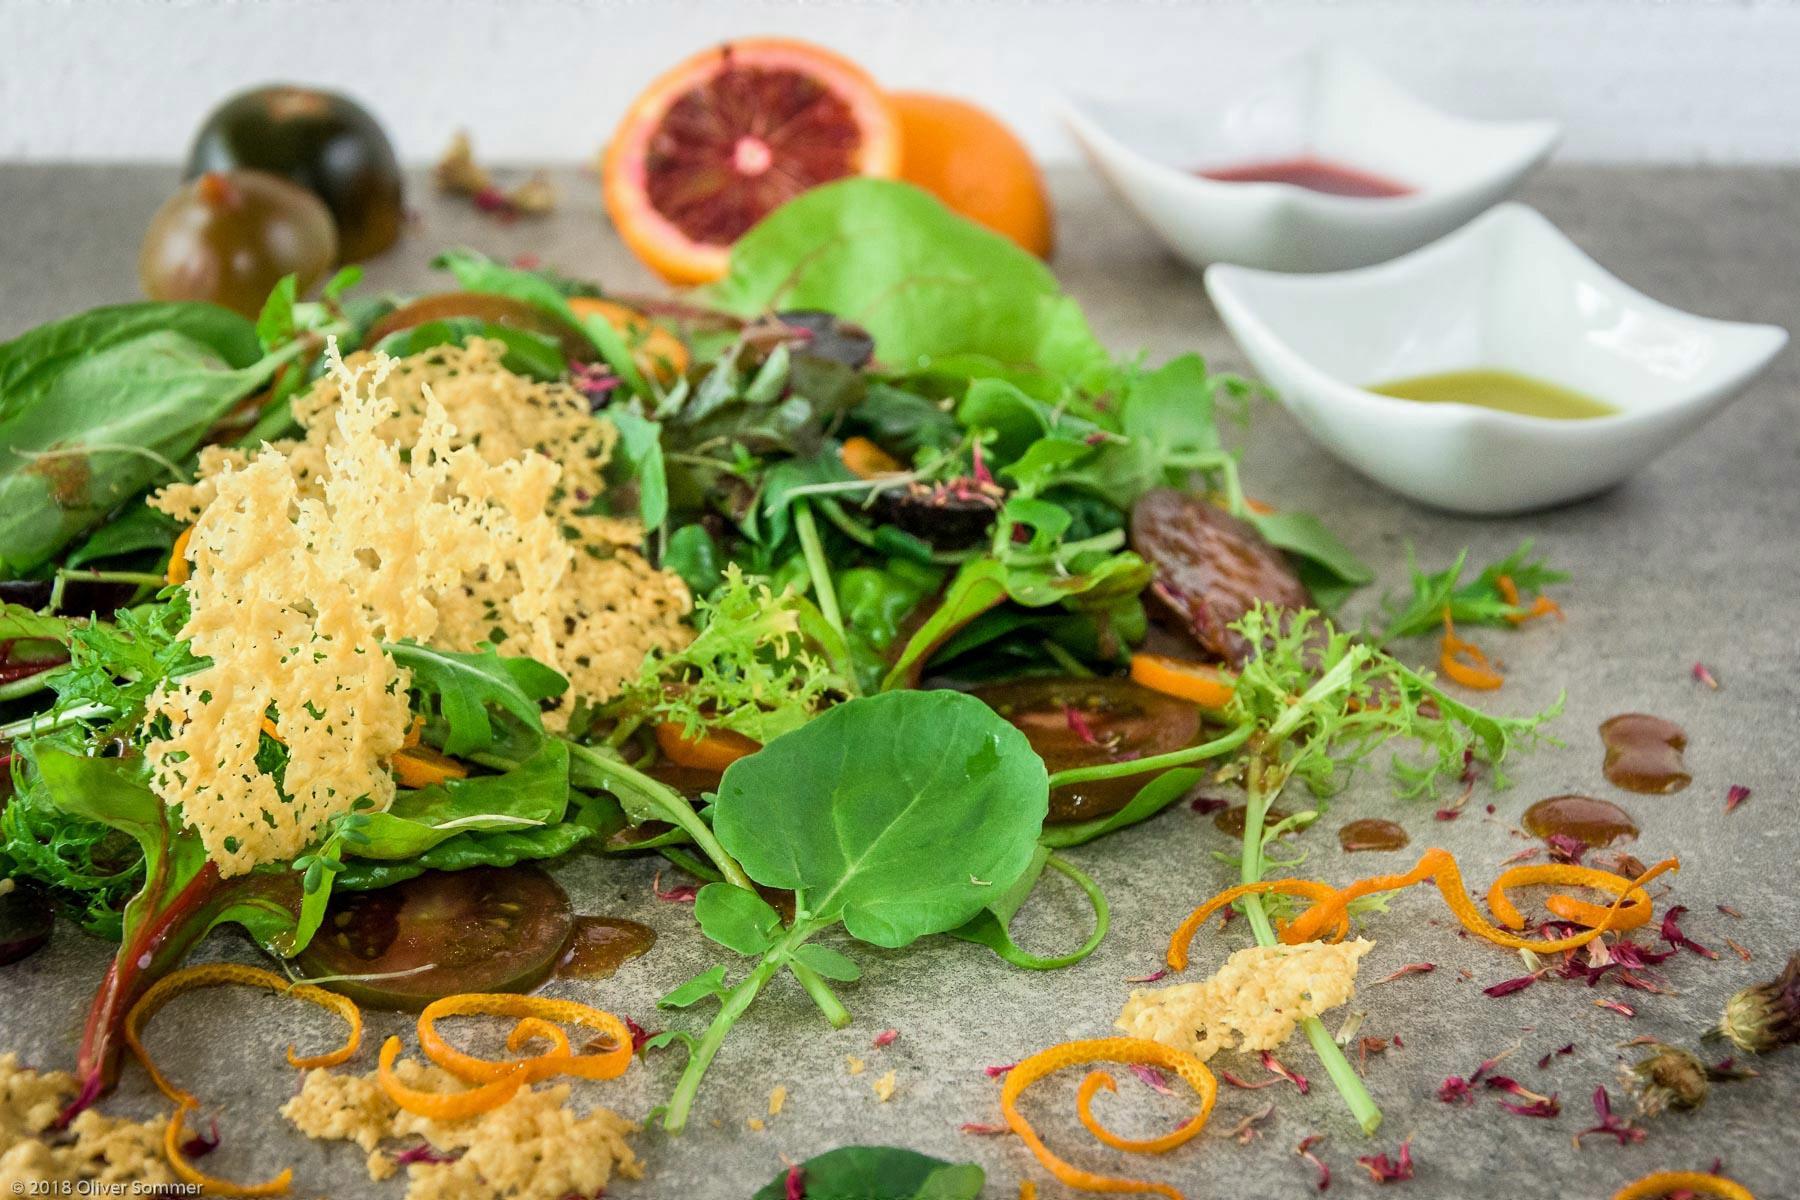 Blood Orange, Kumquat, Parmesan crisp, salad